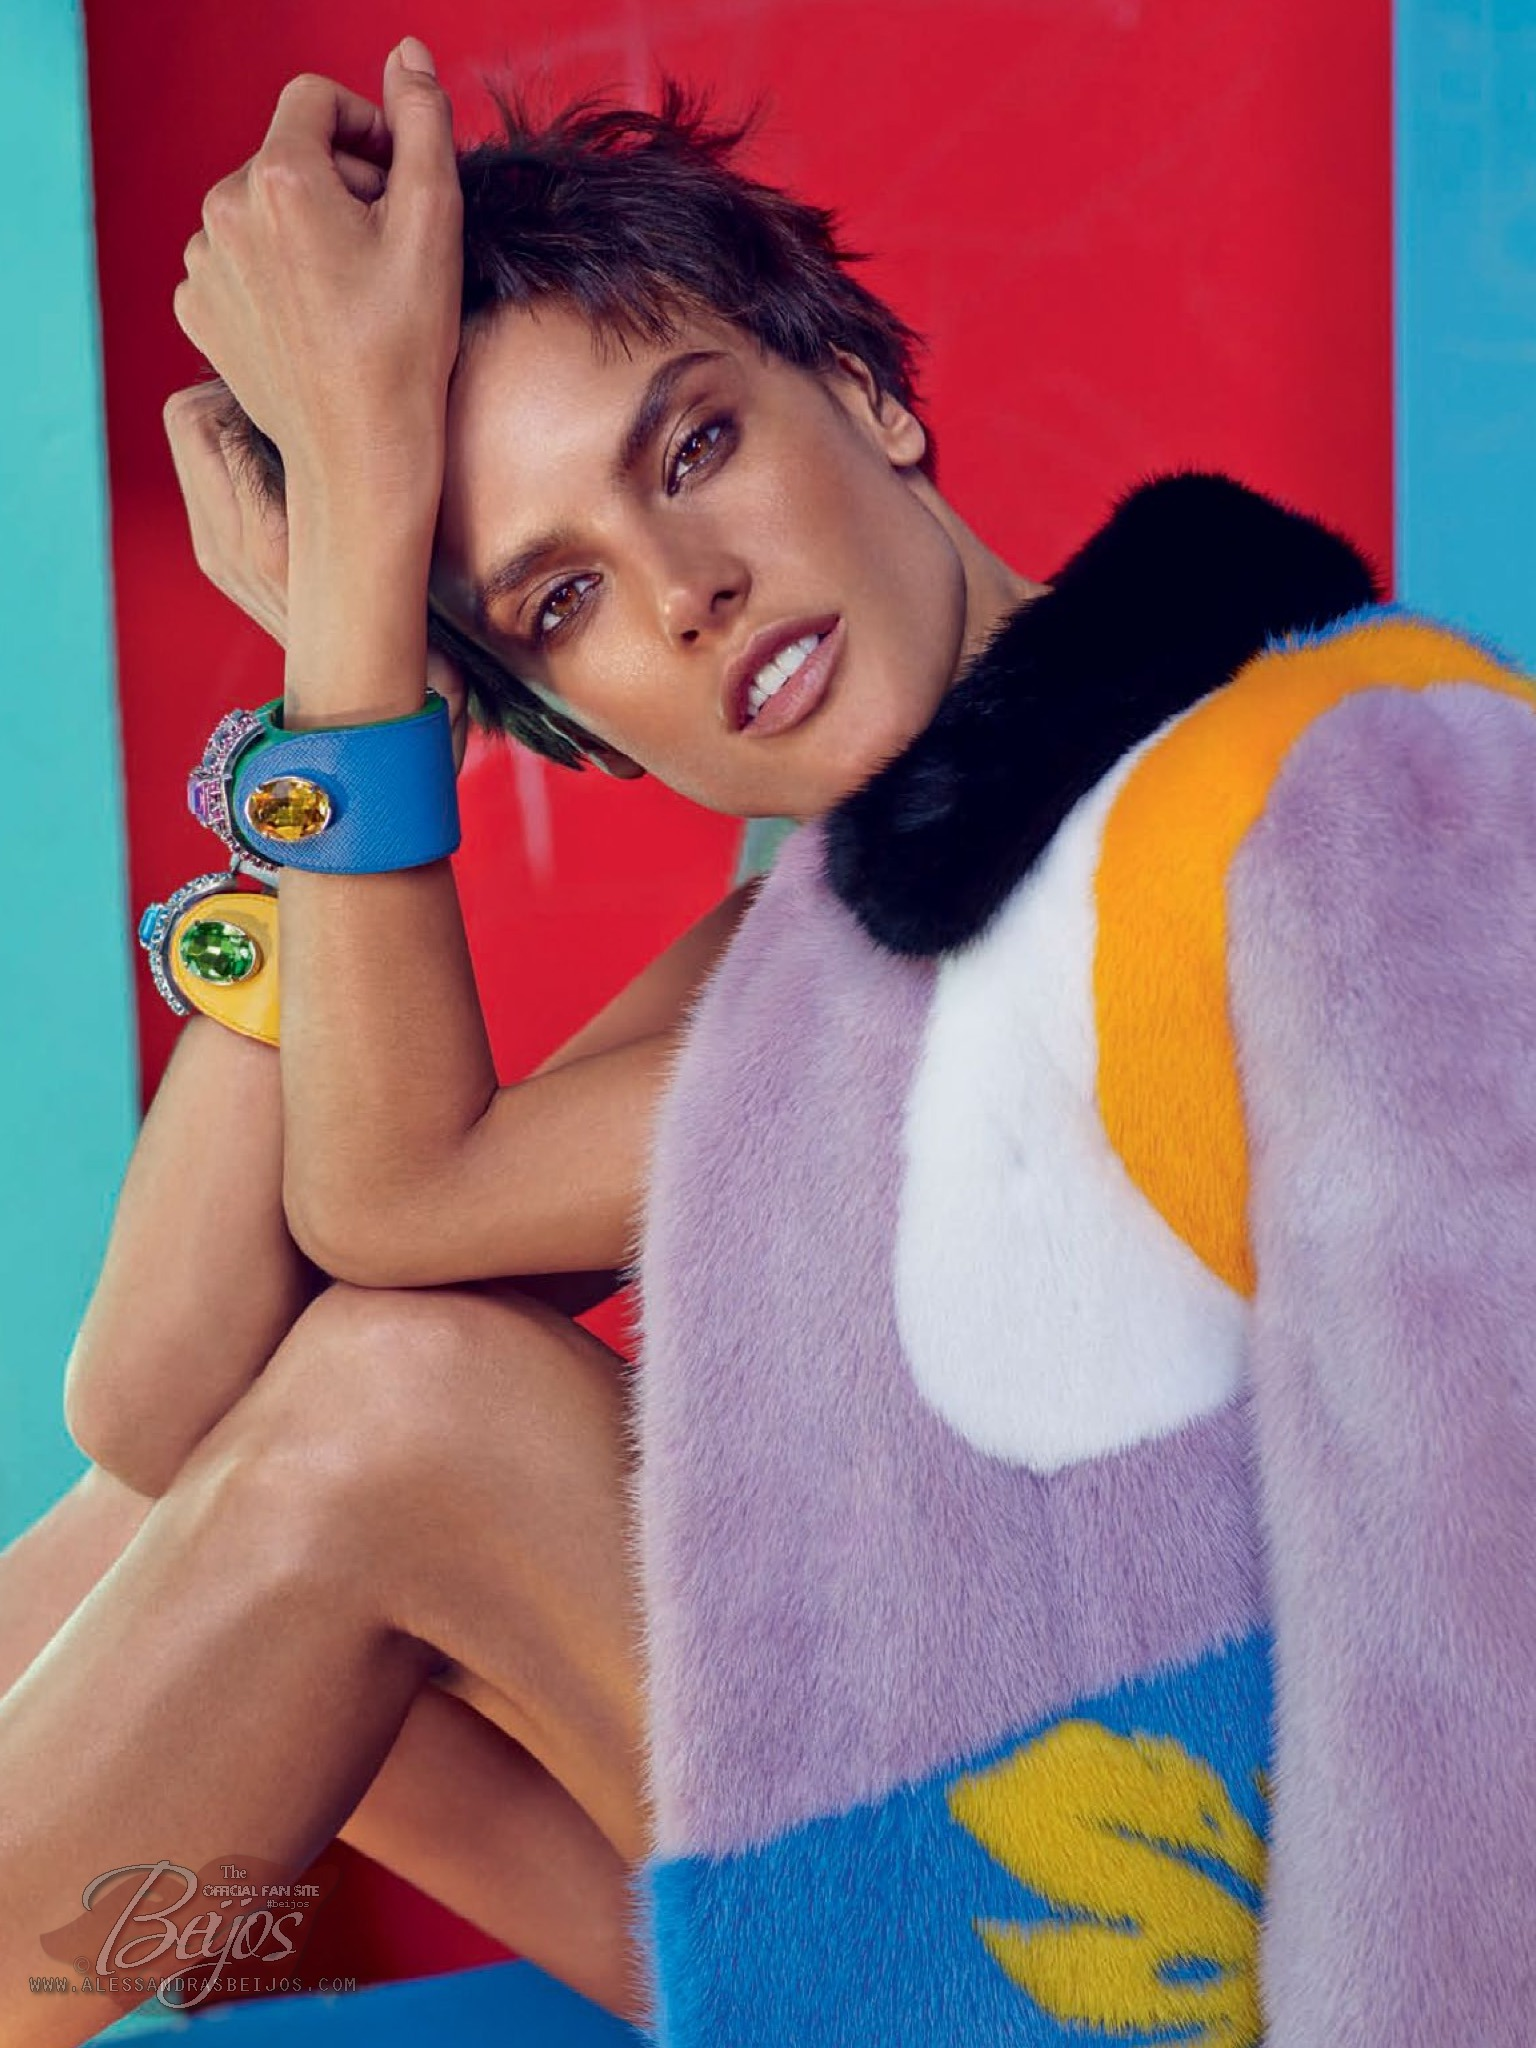 ��� ��������� �������� ��� ���� Vogue �������� ���� 2014